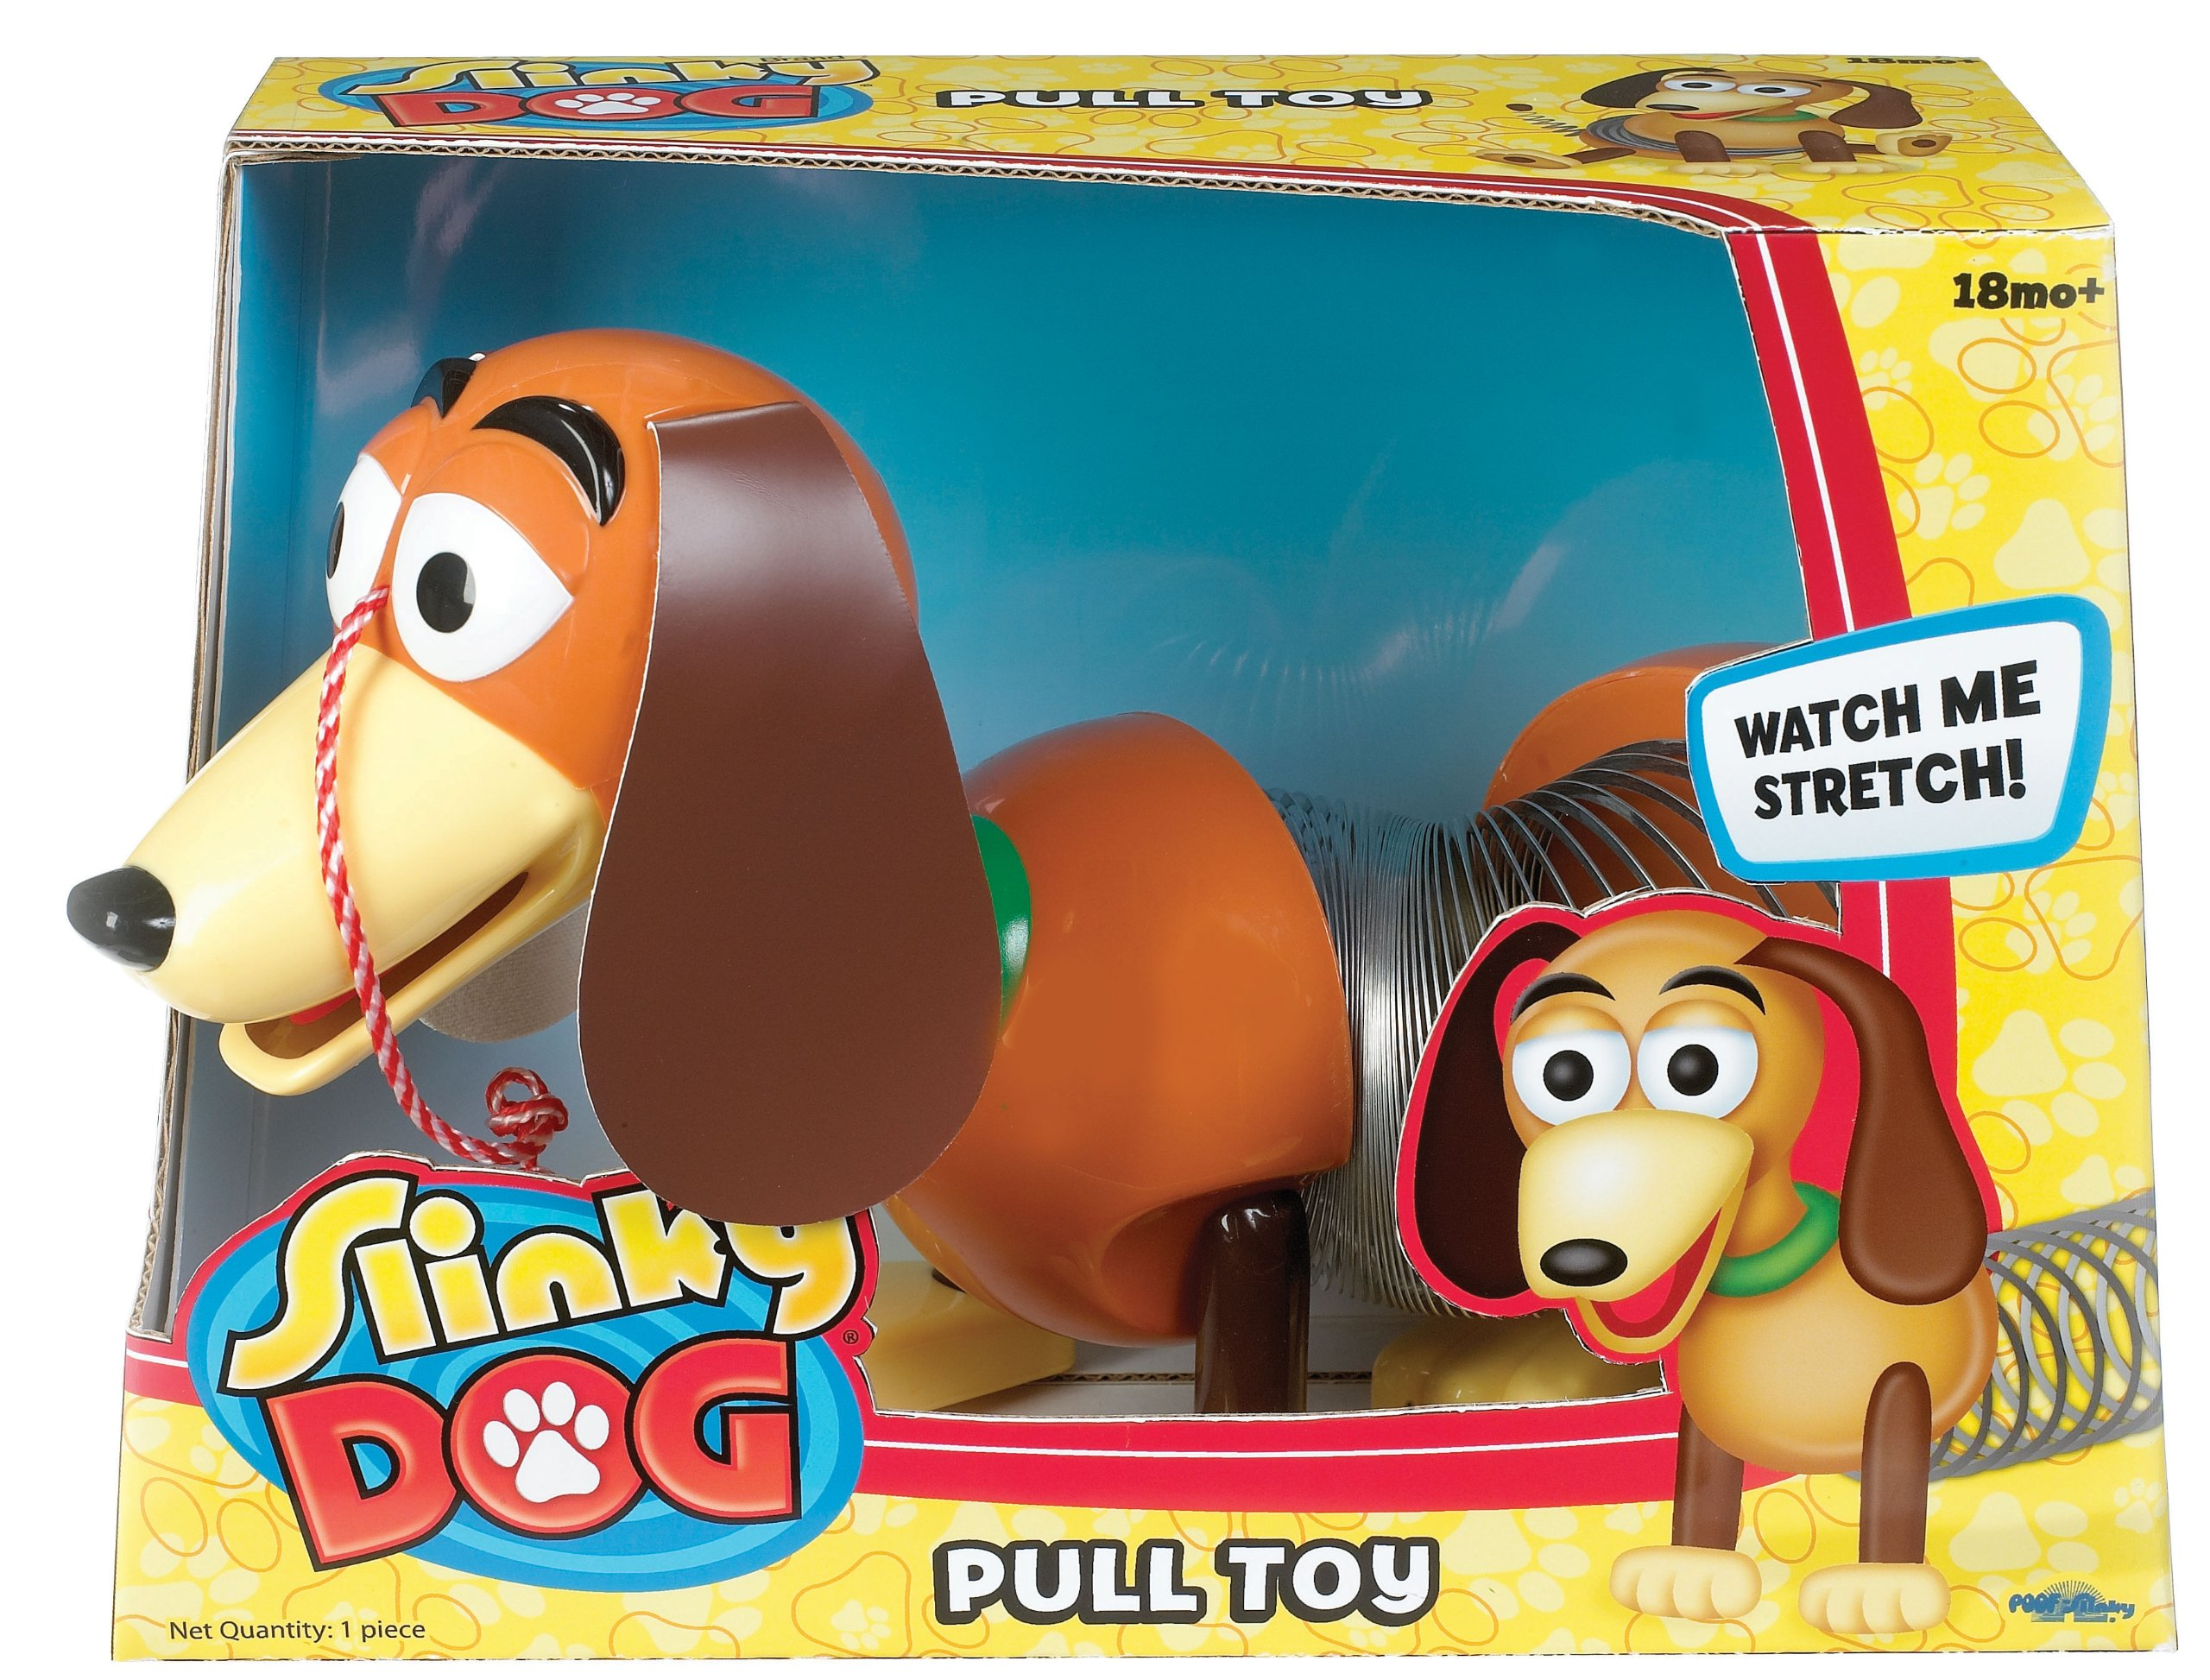 The Original Slinky Brand Slinky Dog